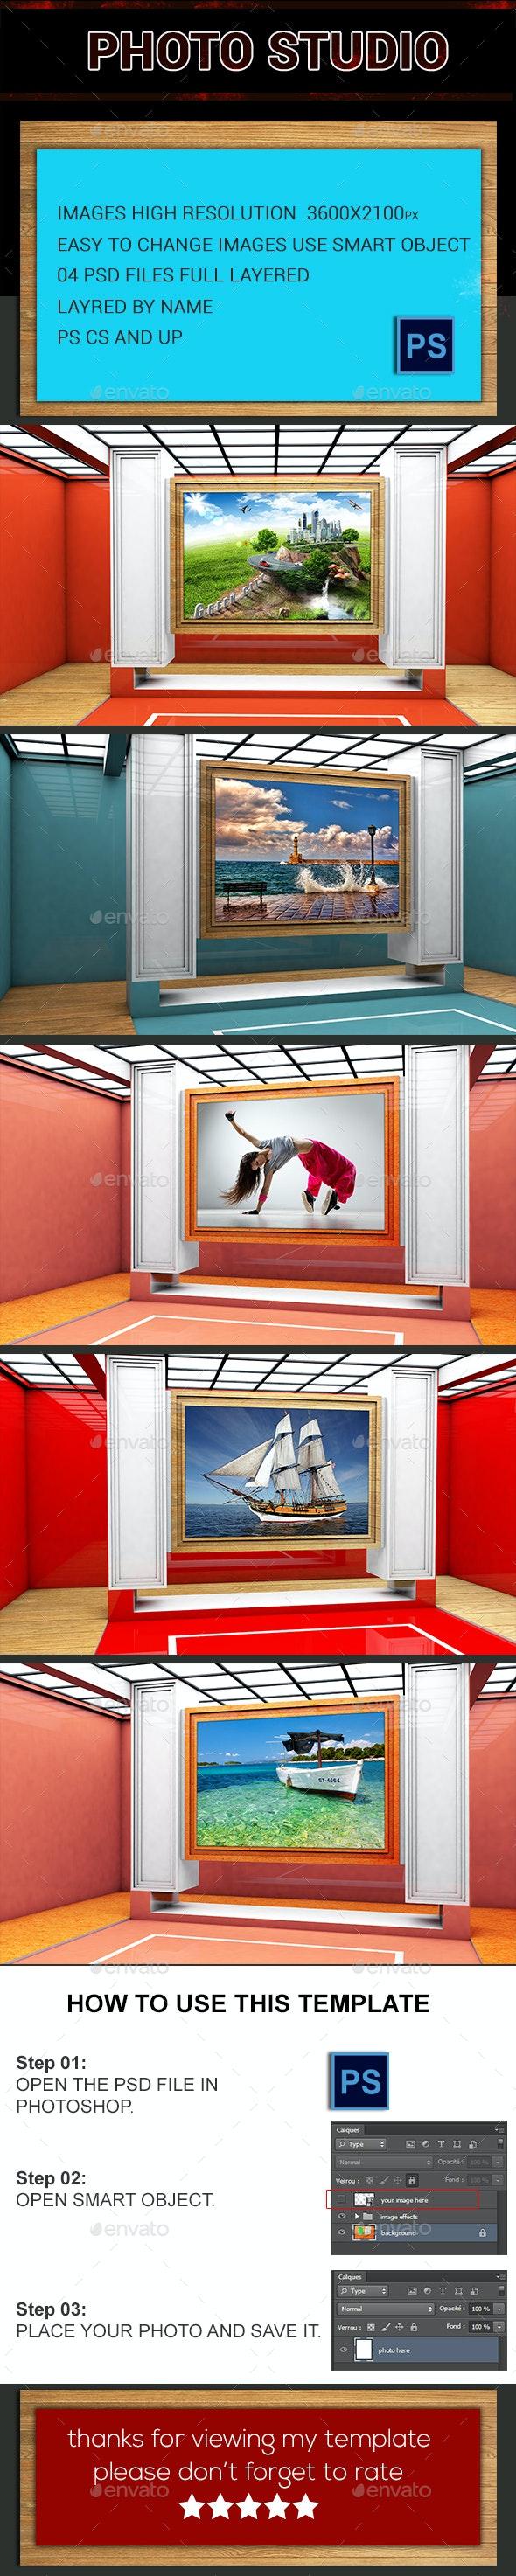 Photo Studio - Urban Photo Templates